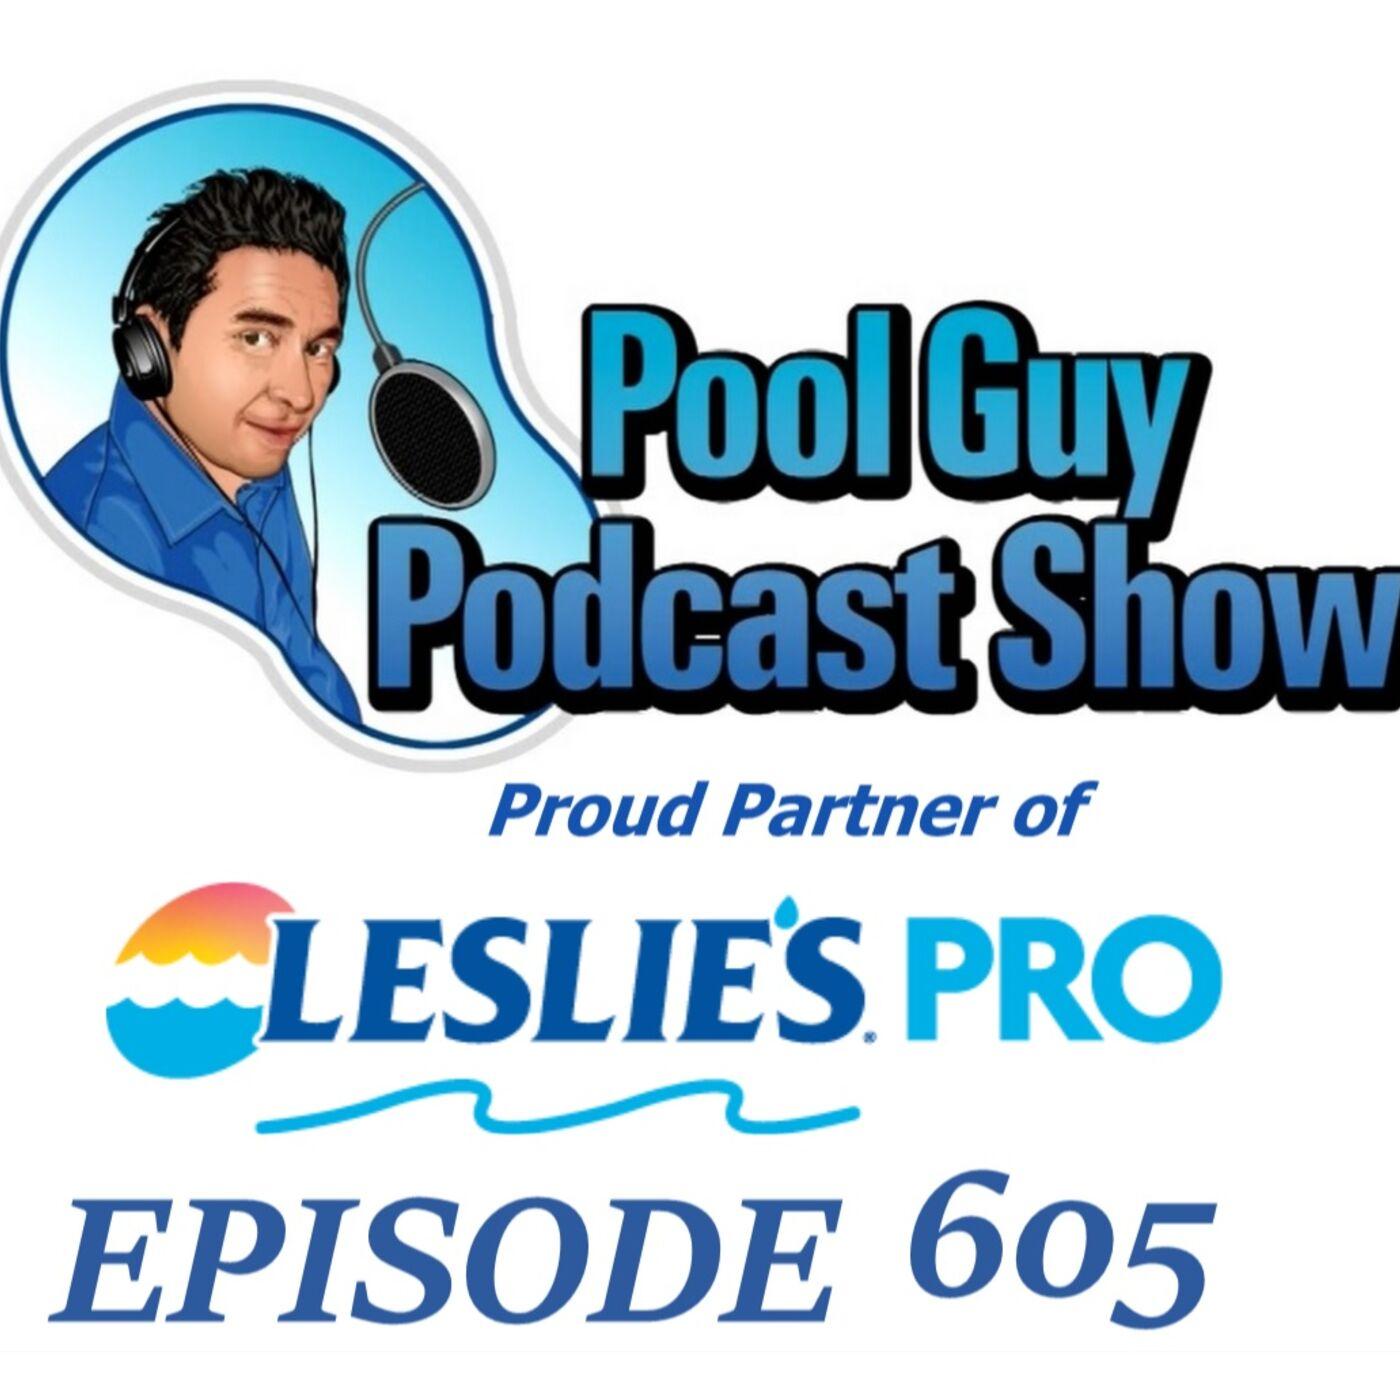 Leslie's Pro Program with Brian Agnew & Chad Christensen of Leslie's Commercial Division